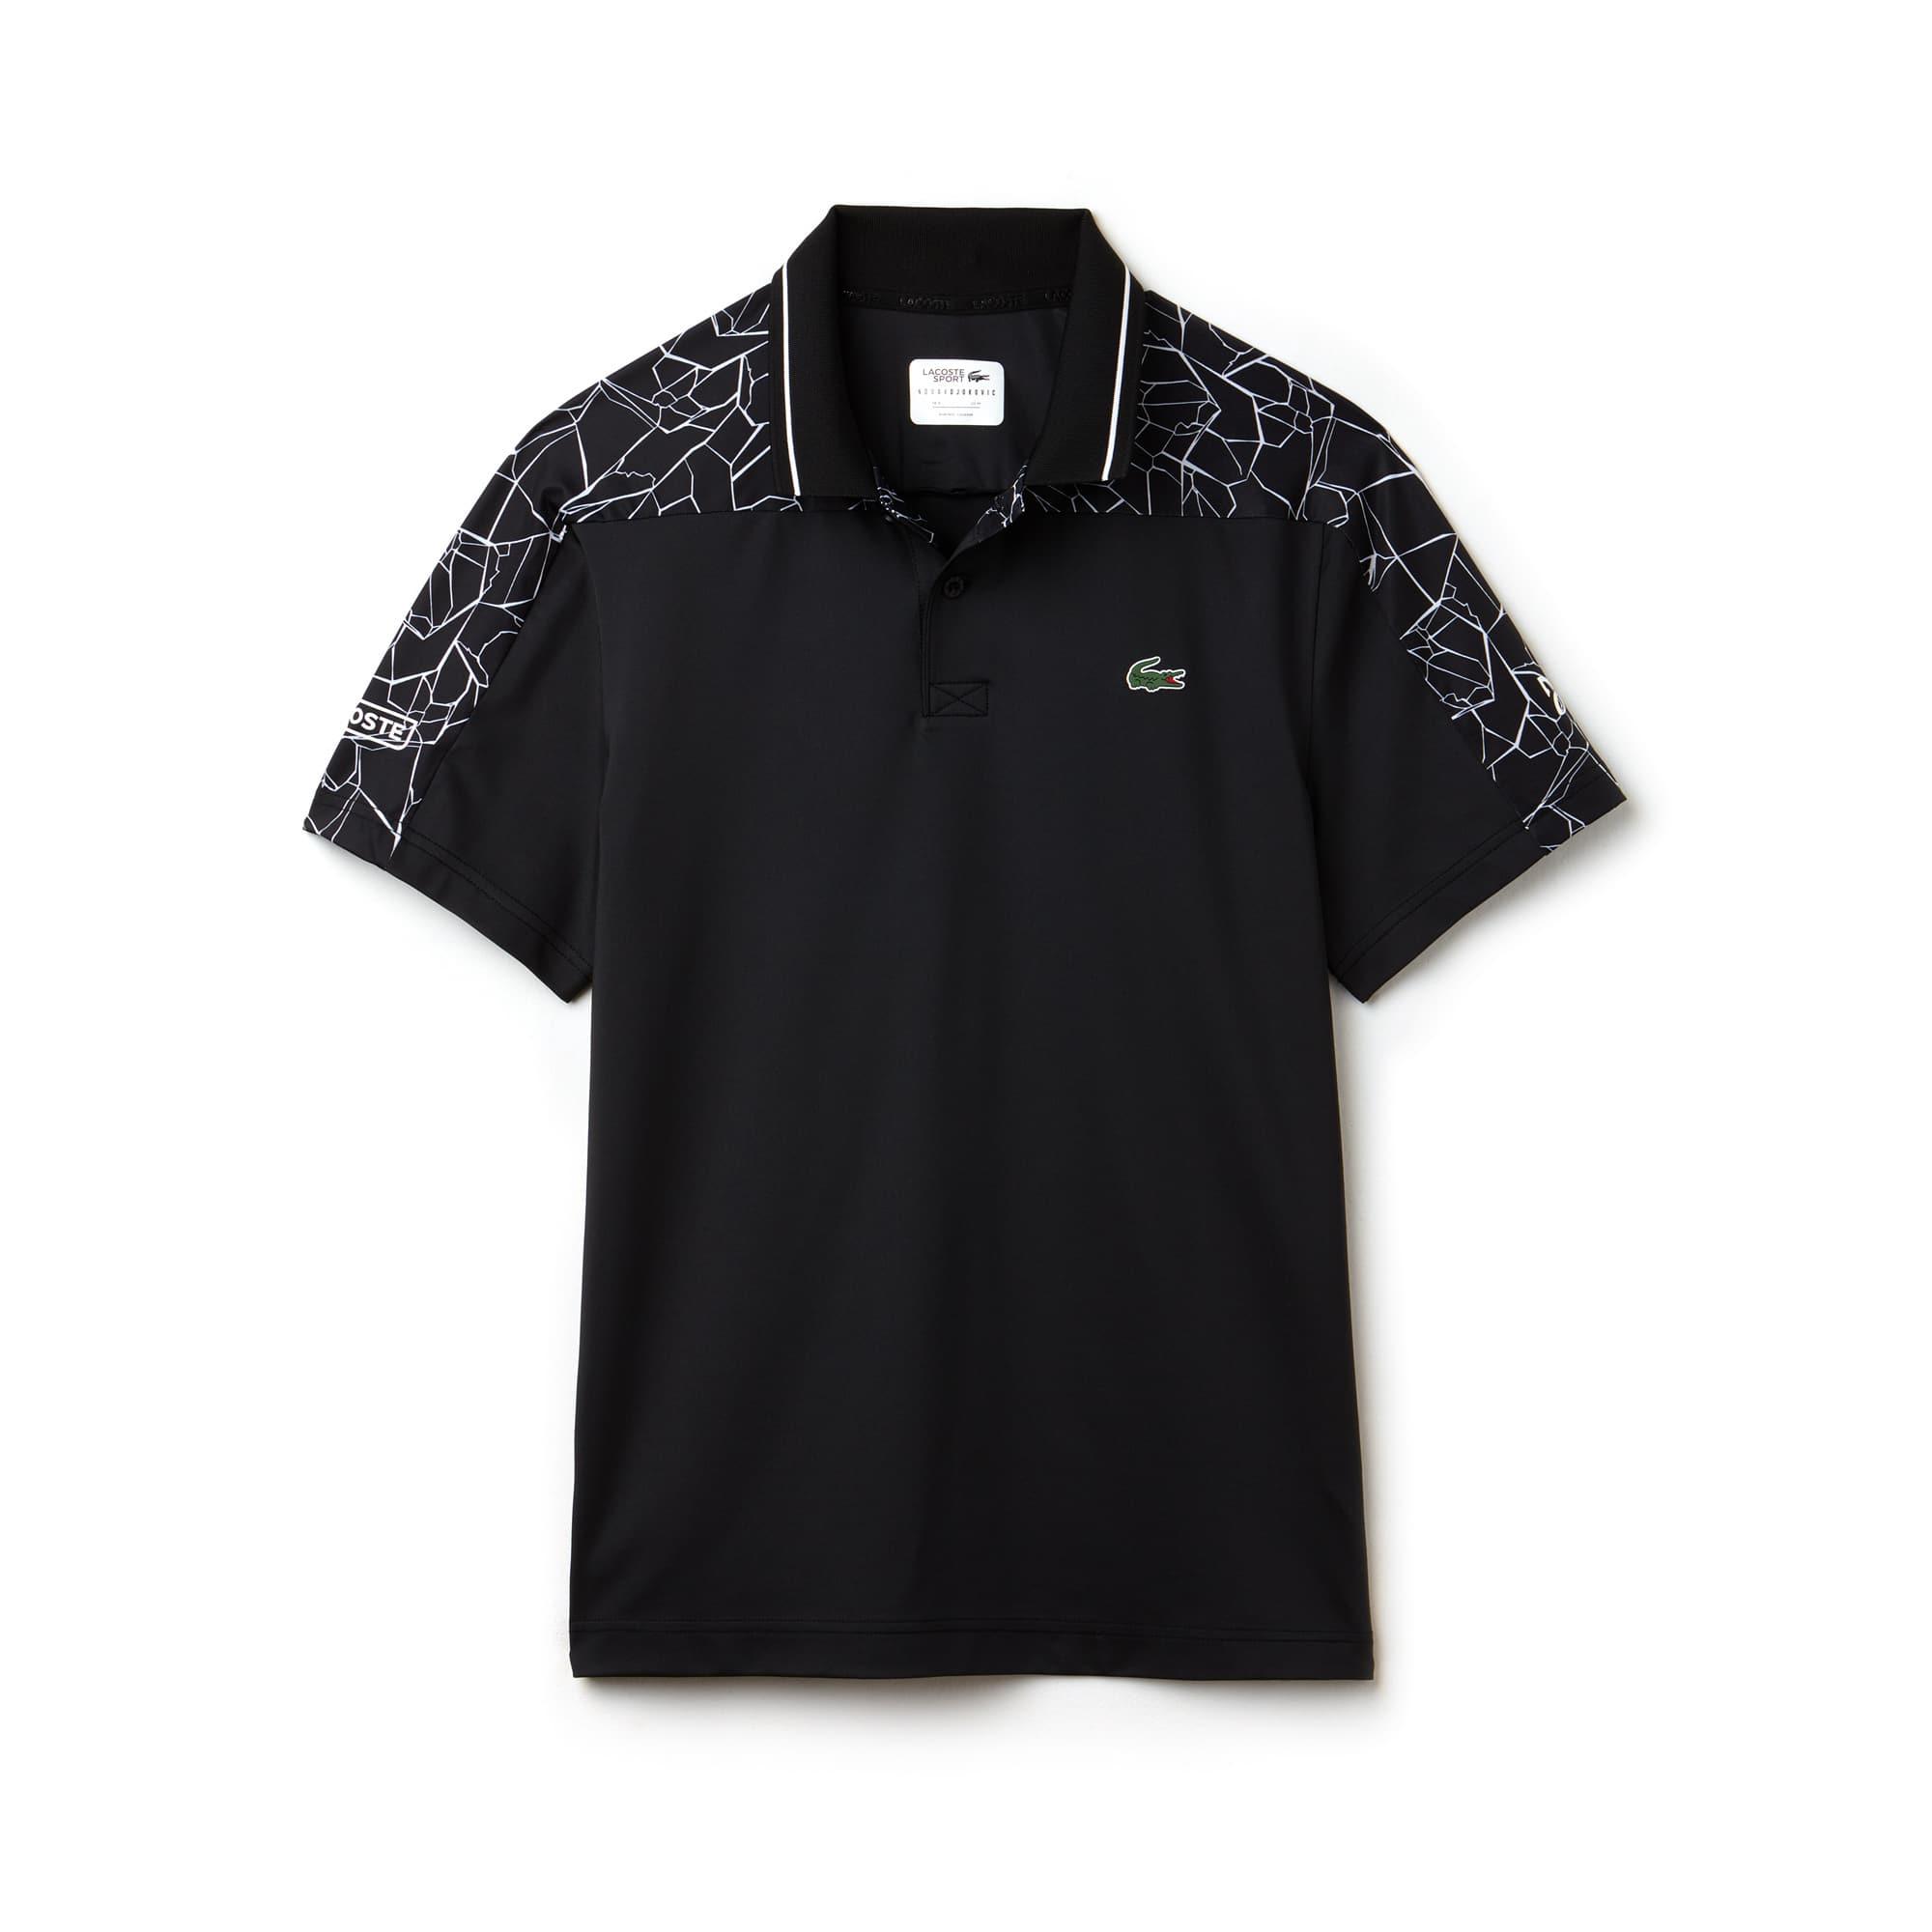 Men's Lacoste SPORT NOVAK DJOKOVIC-ON COURT COLLECTION Stretch Technical Jersey Polo Shirt